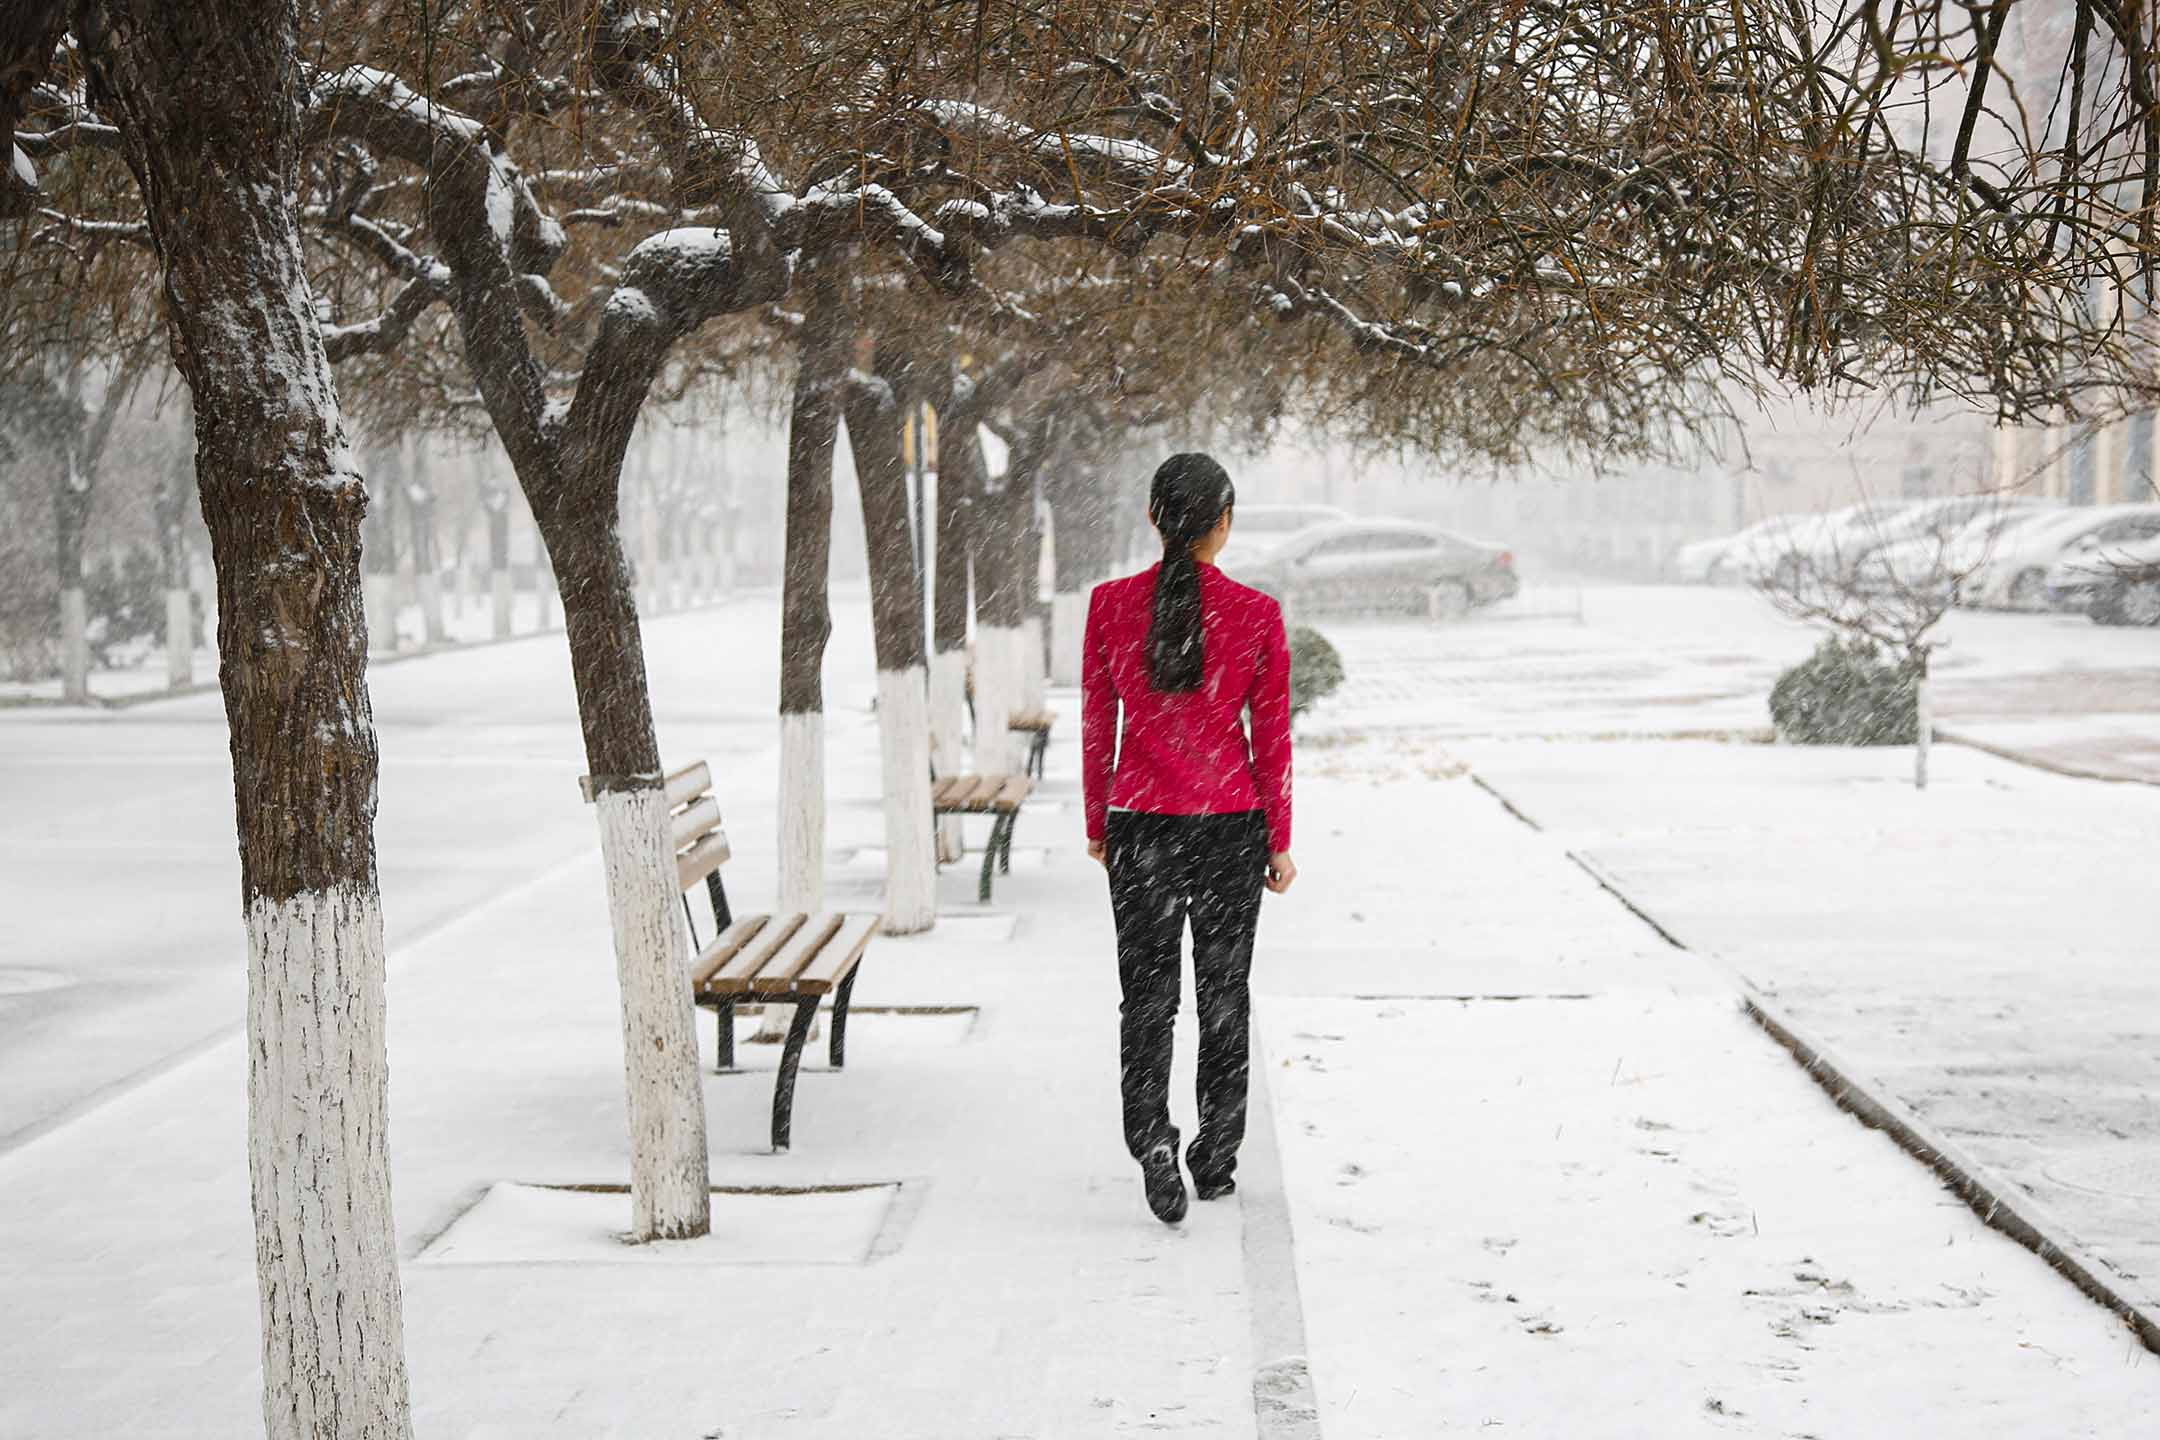 2017年2月21日北京,一個女人在雪中行走。 圖:Visual China Group via Getty Images